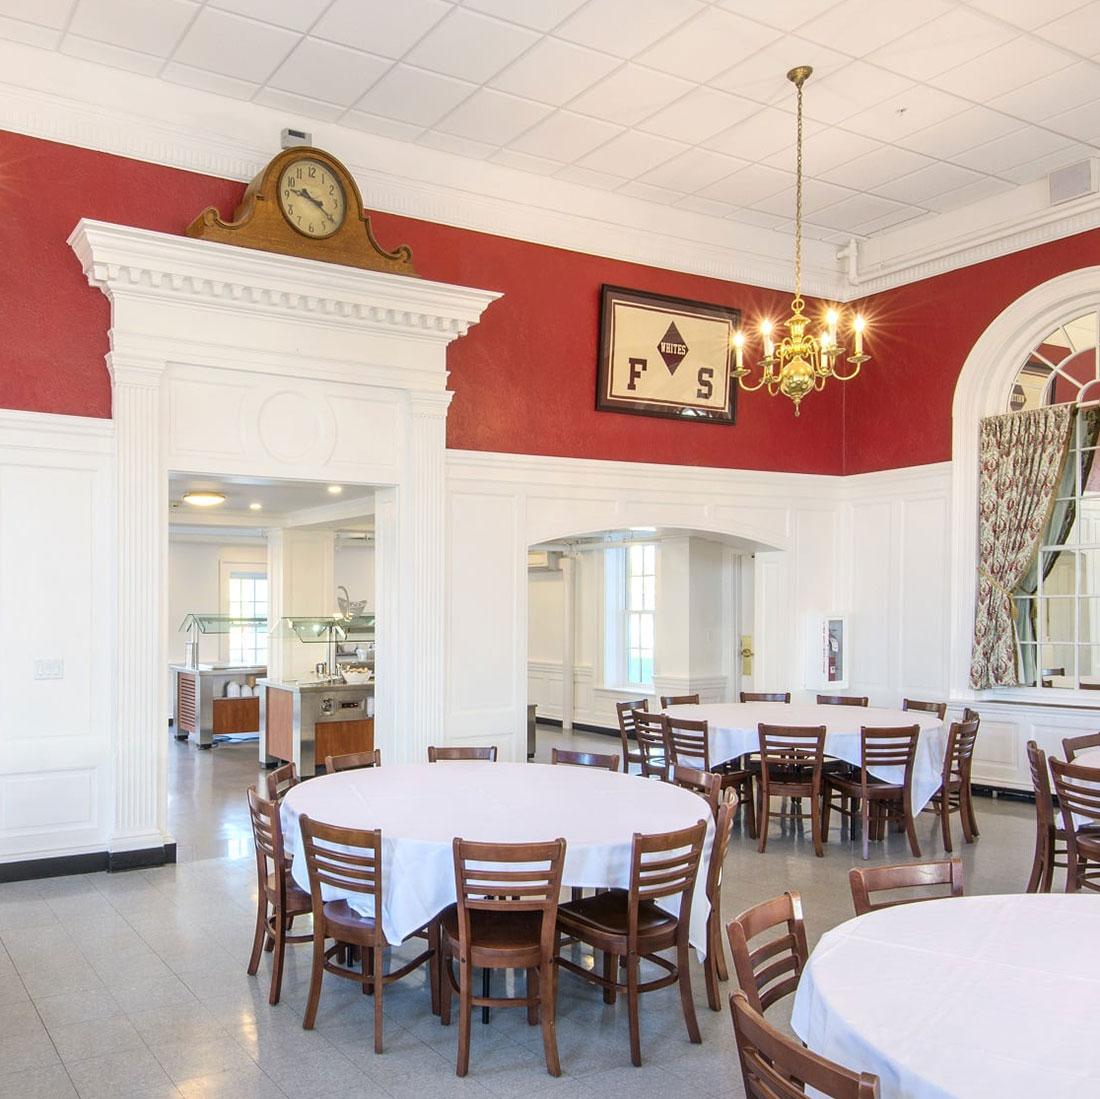 Dining Hall Fay School